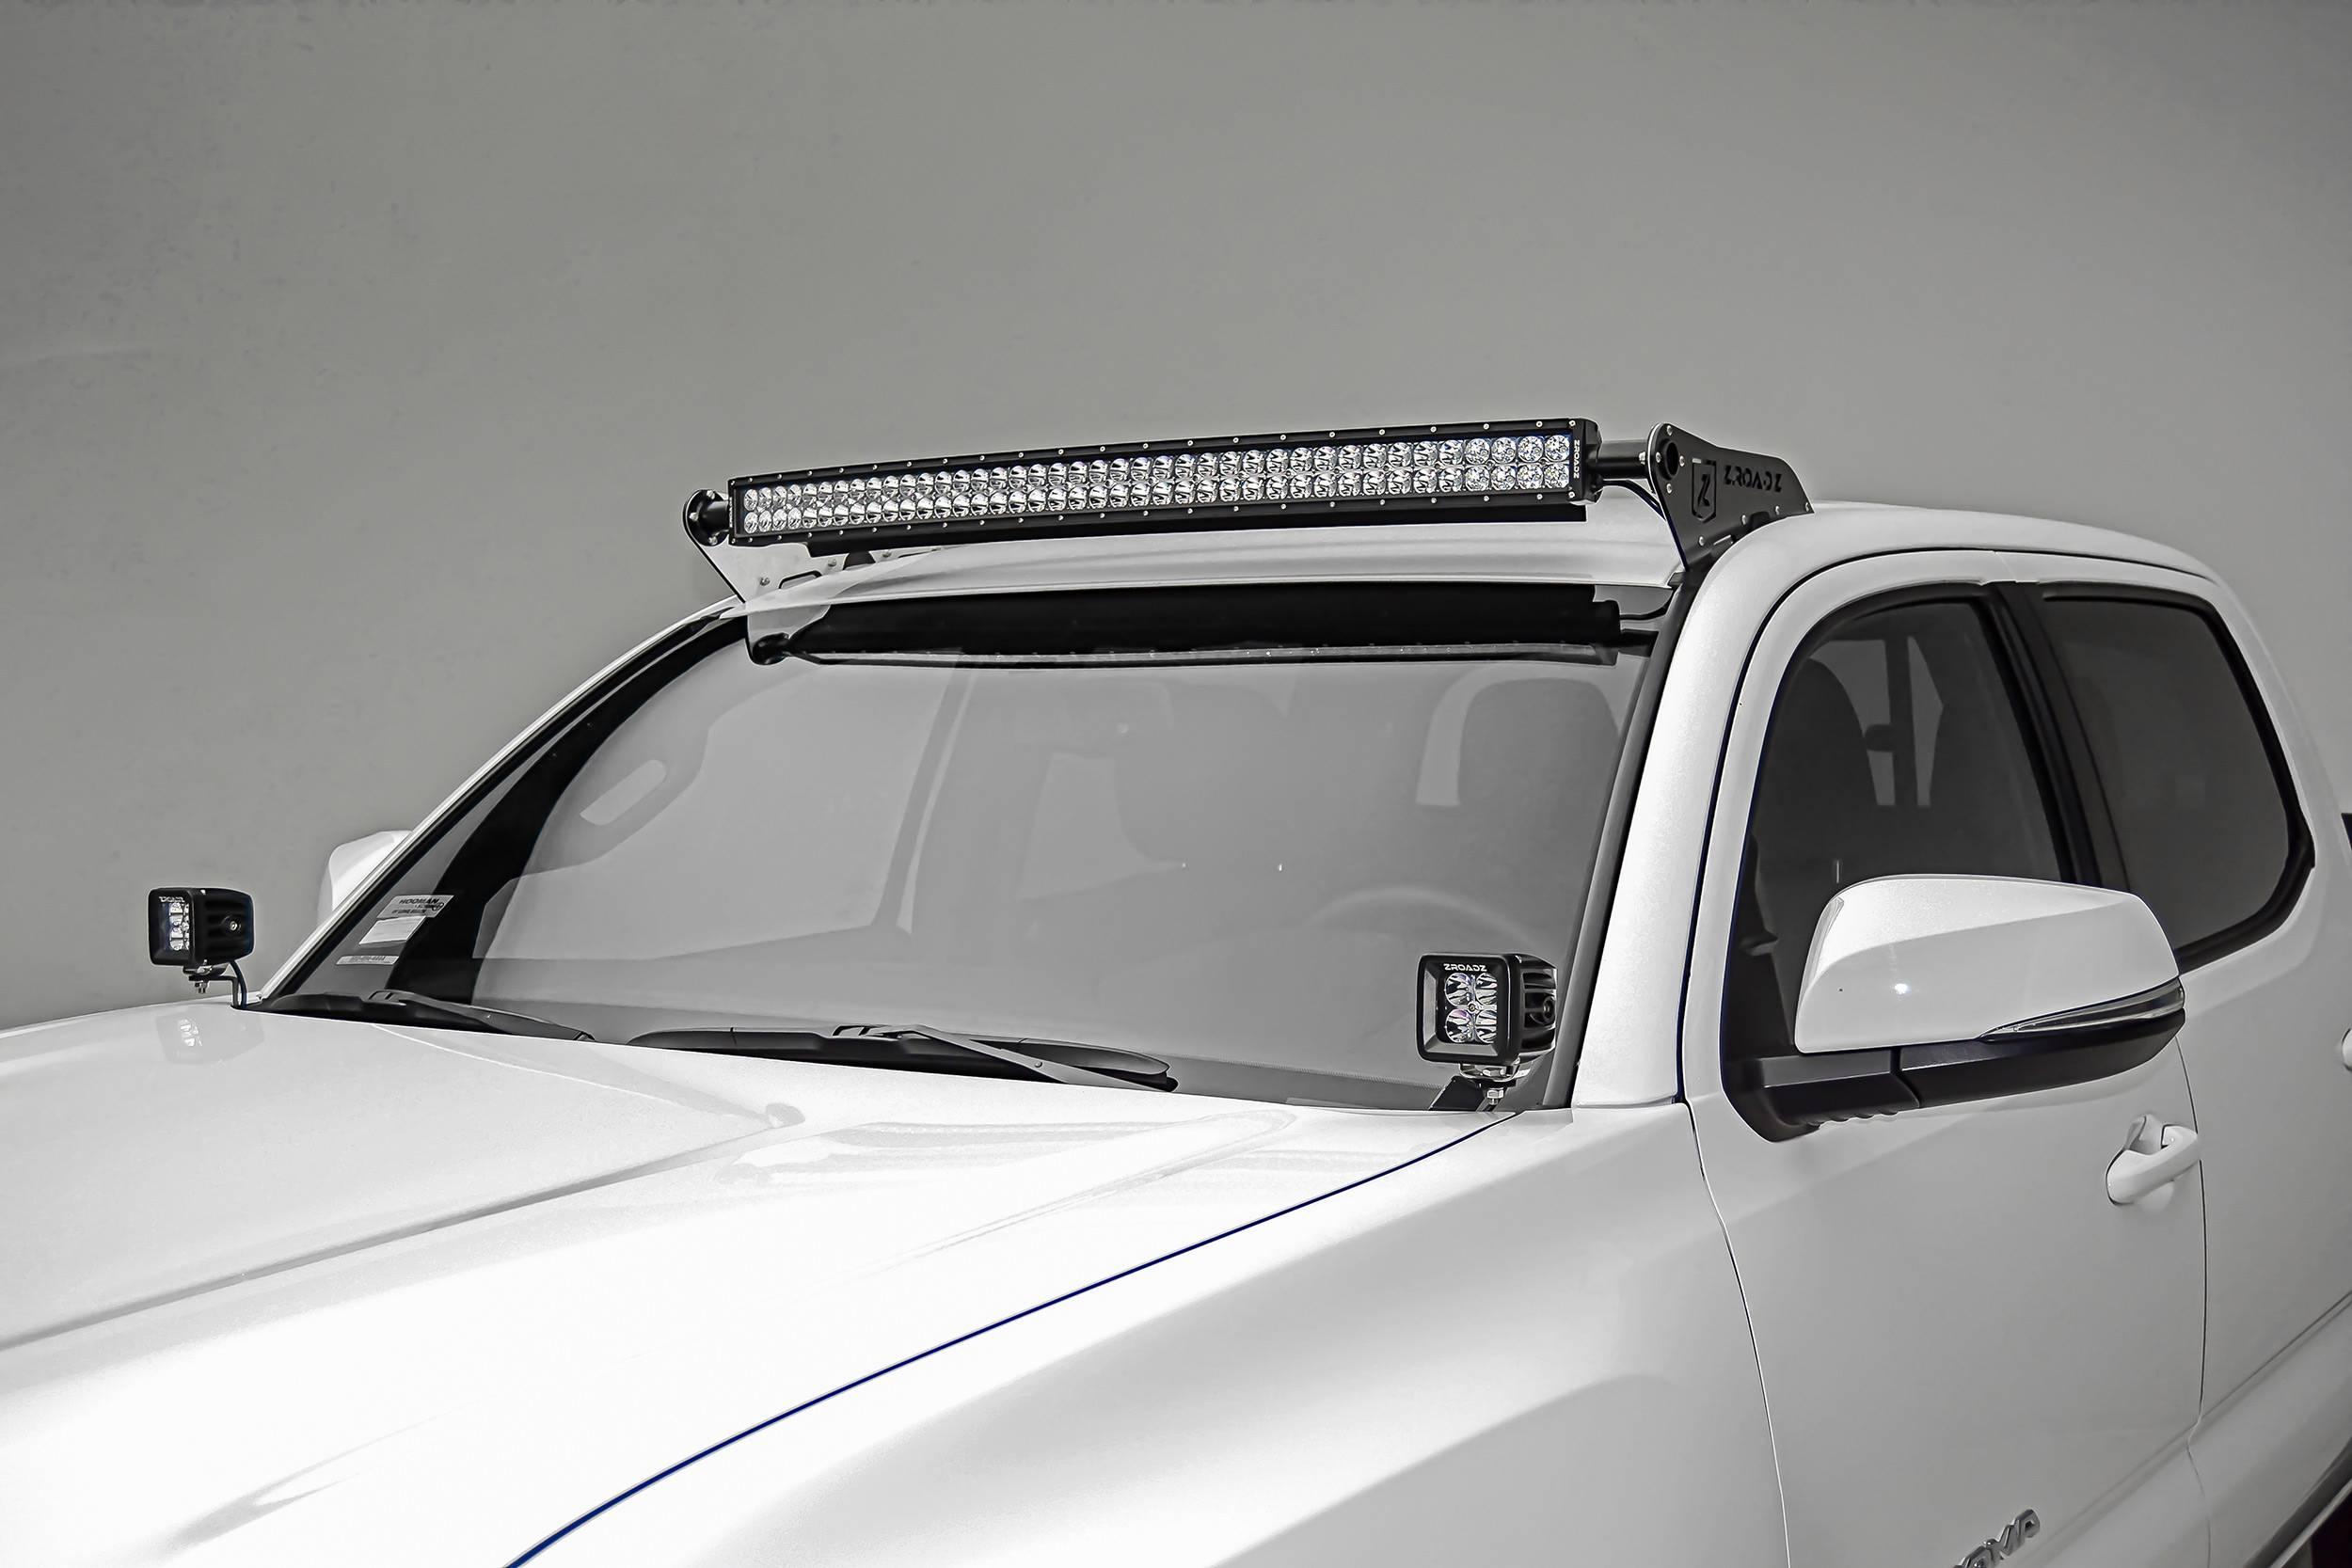 ZROADZ                                             - 2005-2020 Toyota Tacoma Front Roof LED Bracket to mount 40 Inch Curved LED Light Bar - PN #Z339401